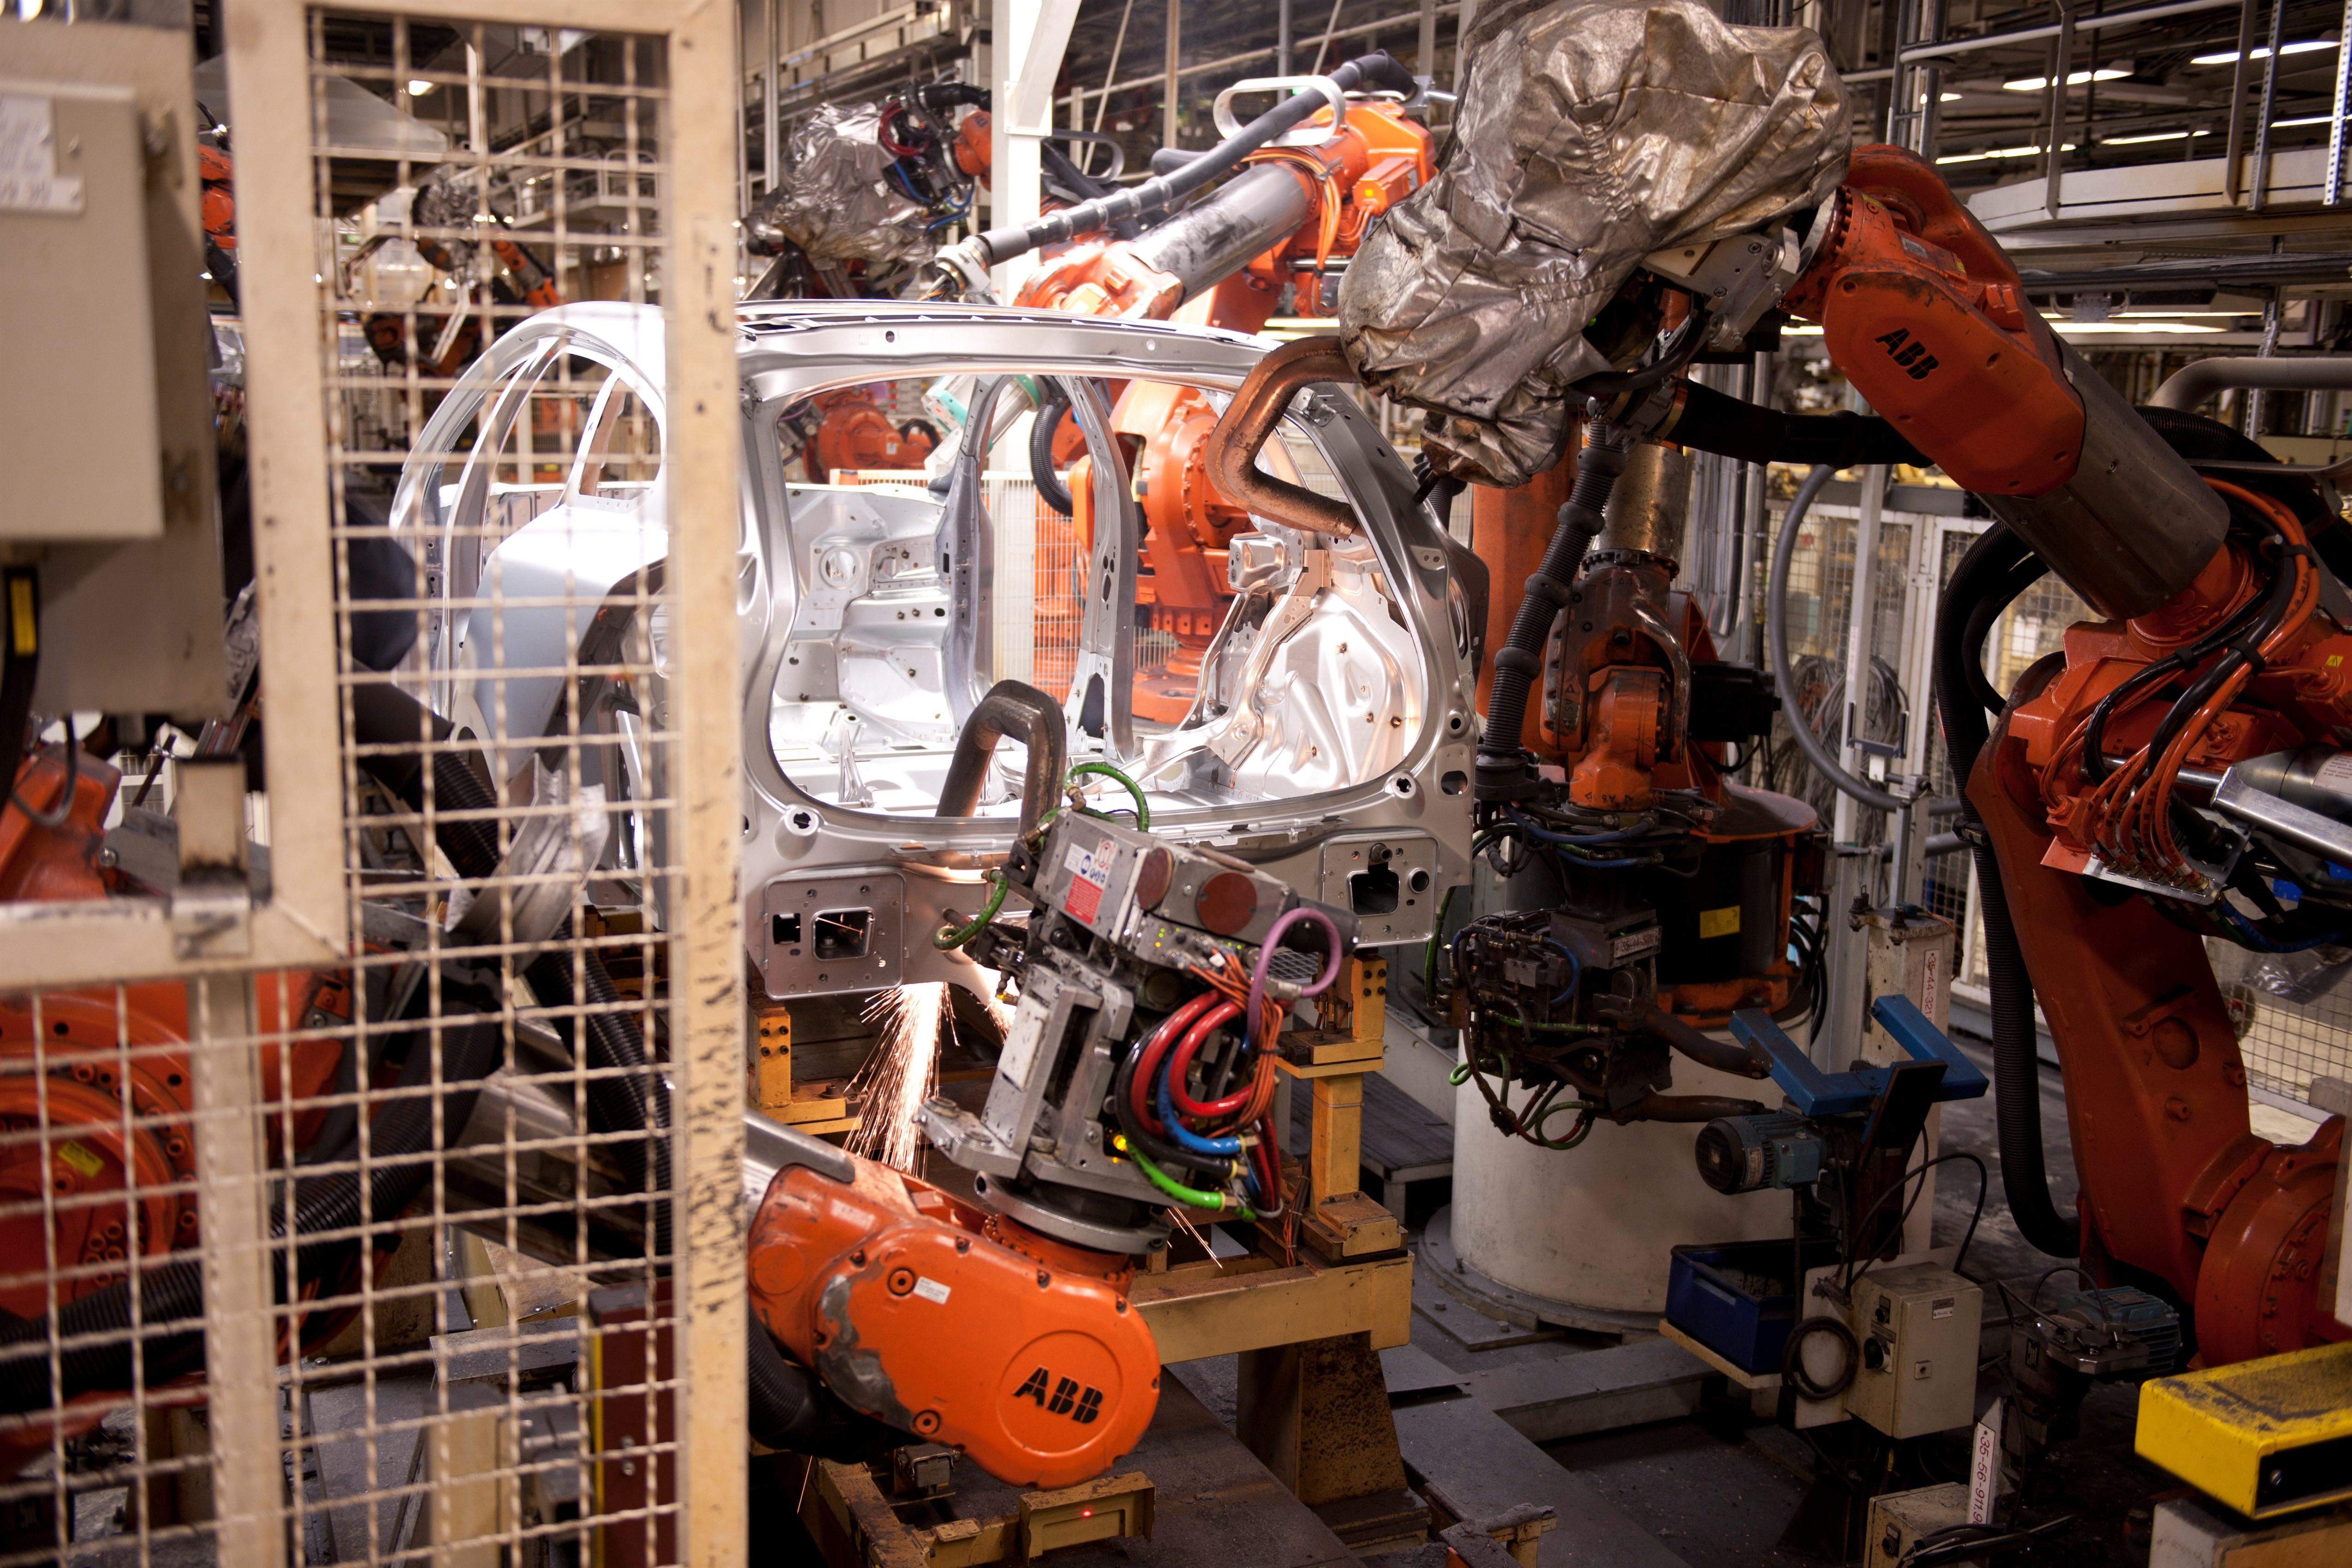 Volvo Adds 1,300 Jobs at Torslanda Factory in Anticipation of New XC90 - autoevolution